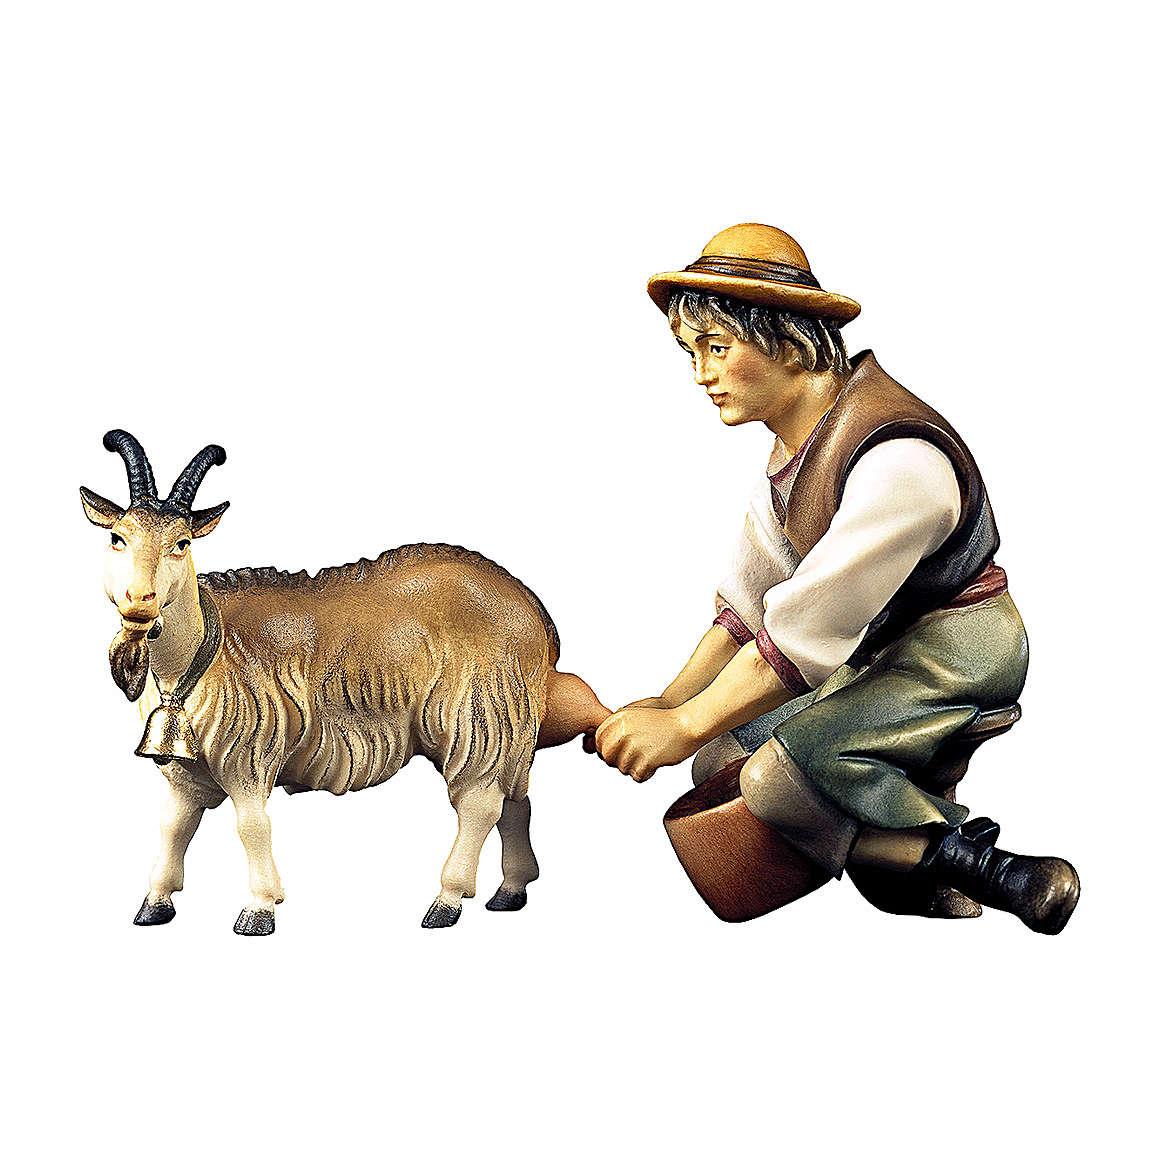 Pastore che munge una capra per presepe Original legno dipinto in Val Gardena 12 cm 4